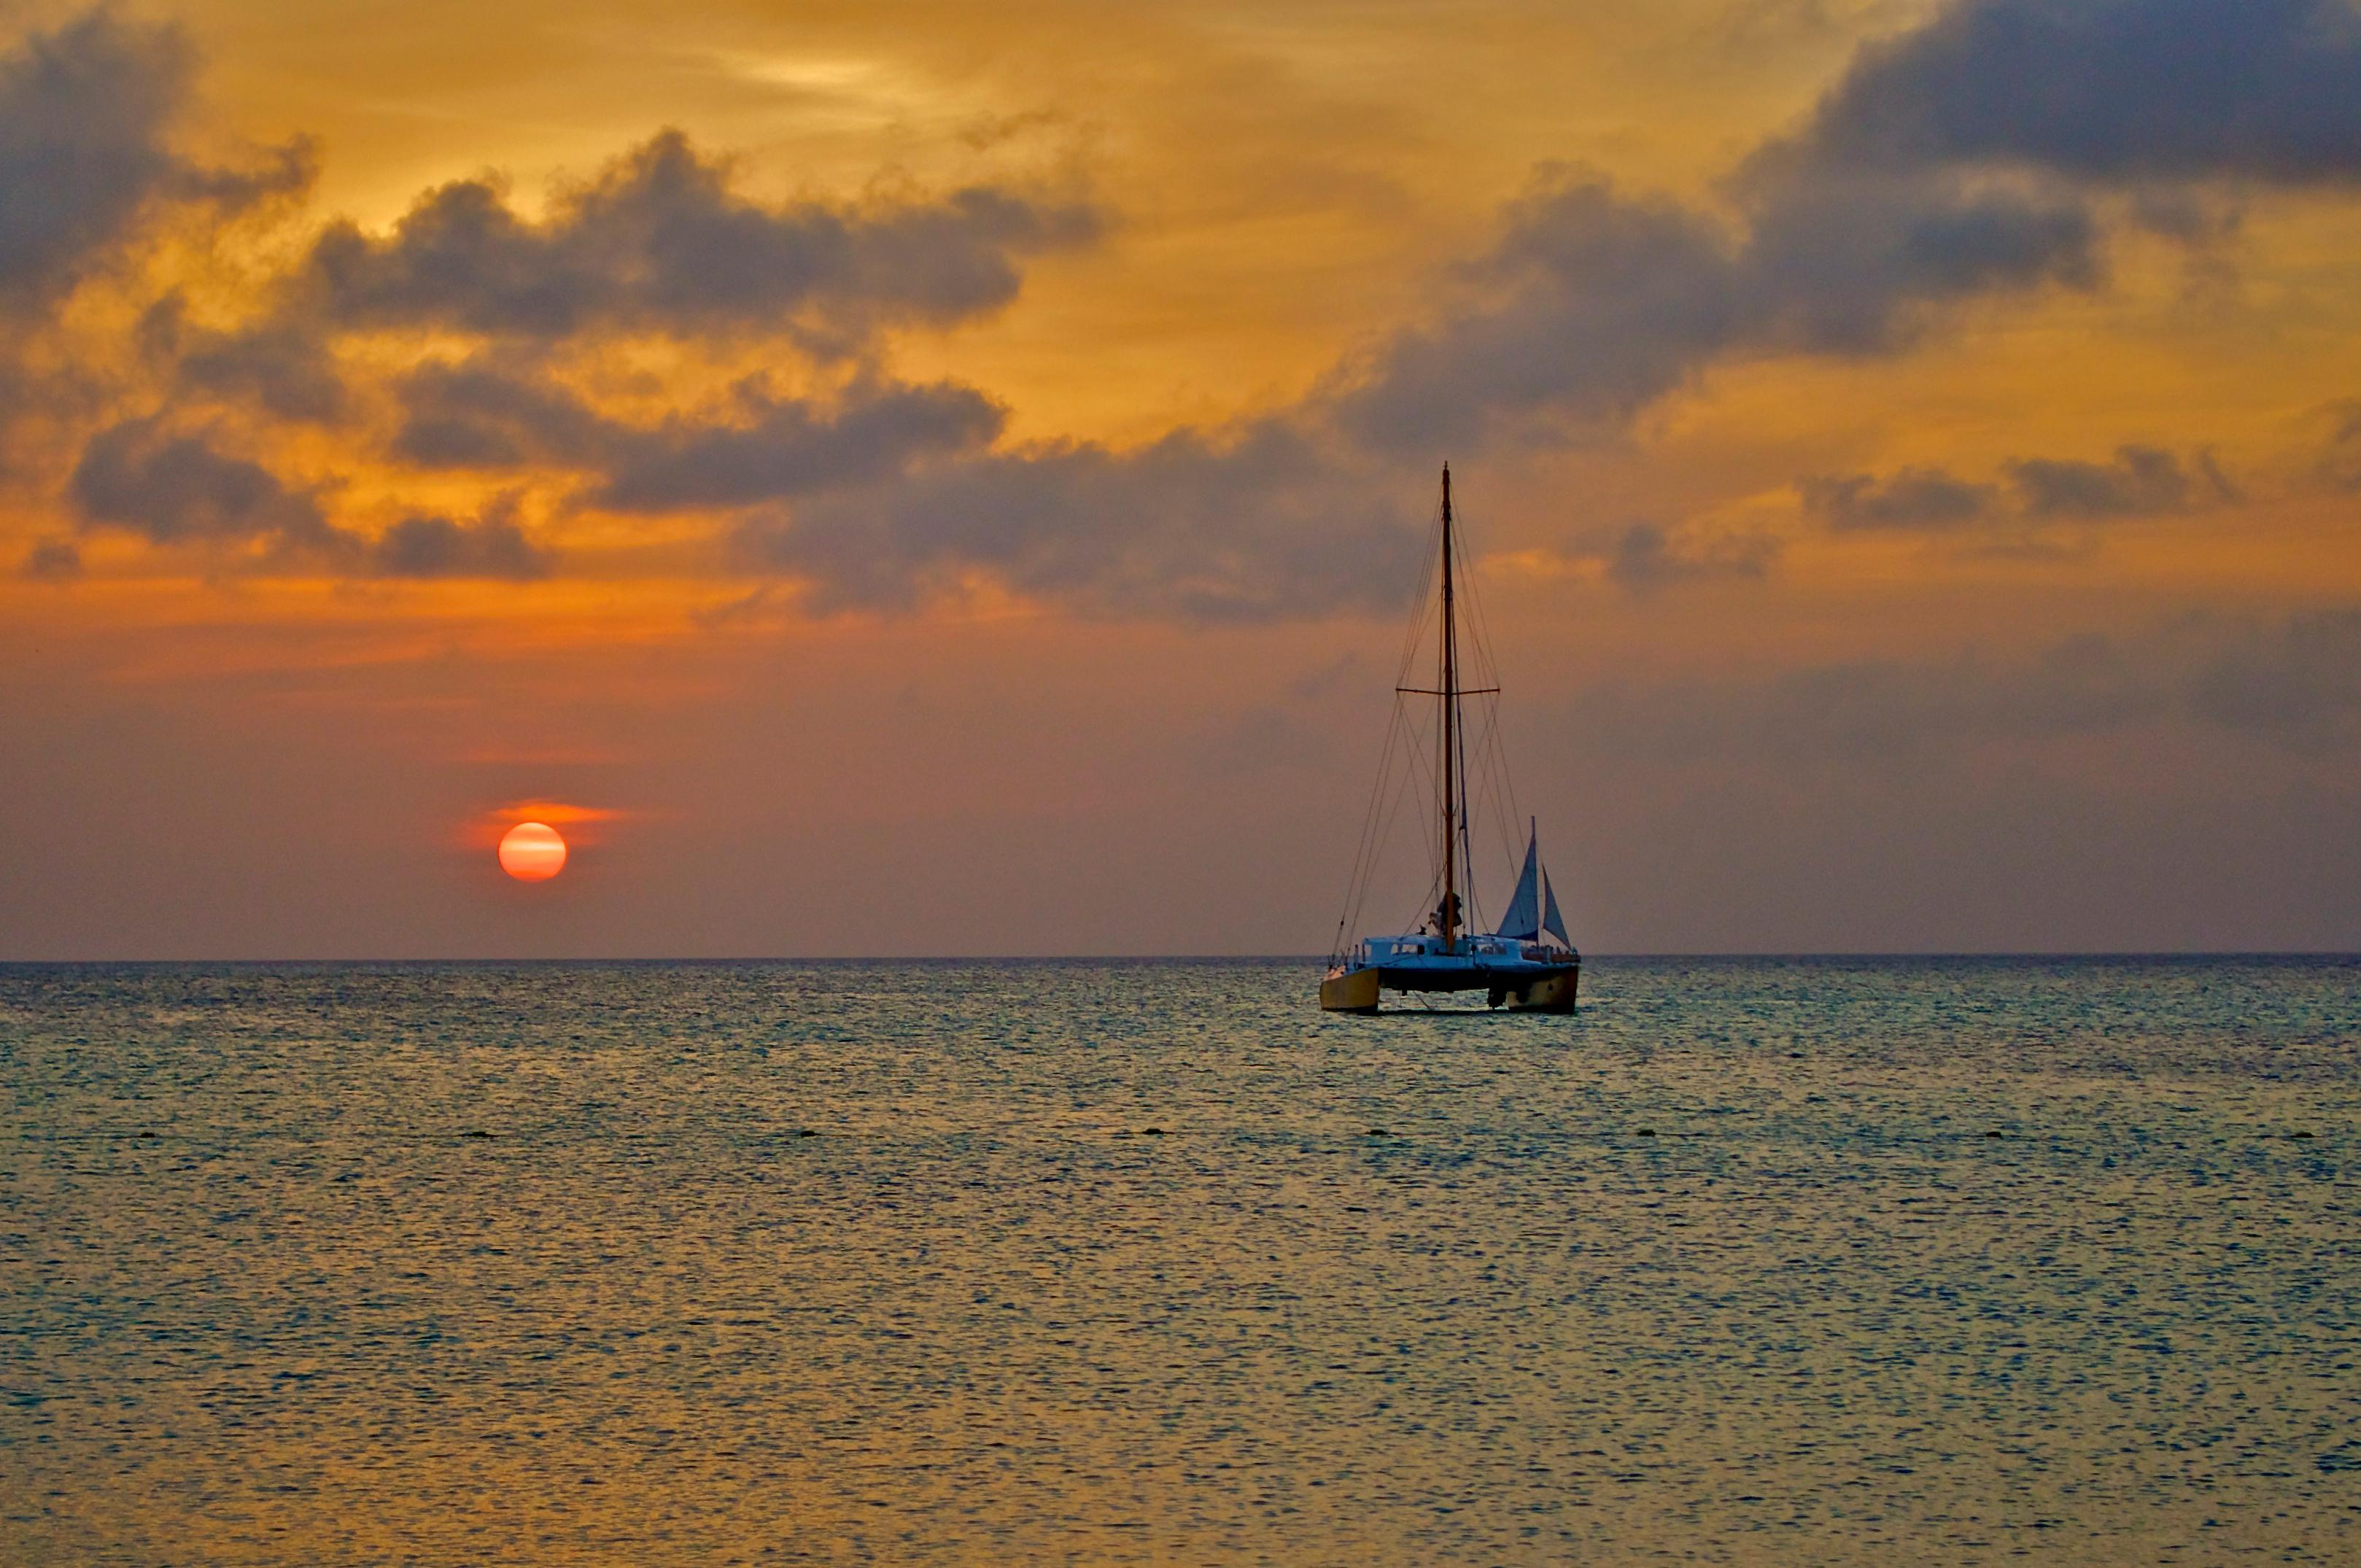 Catamaran on the ocean during sunset.